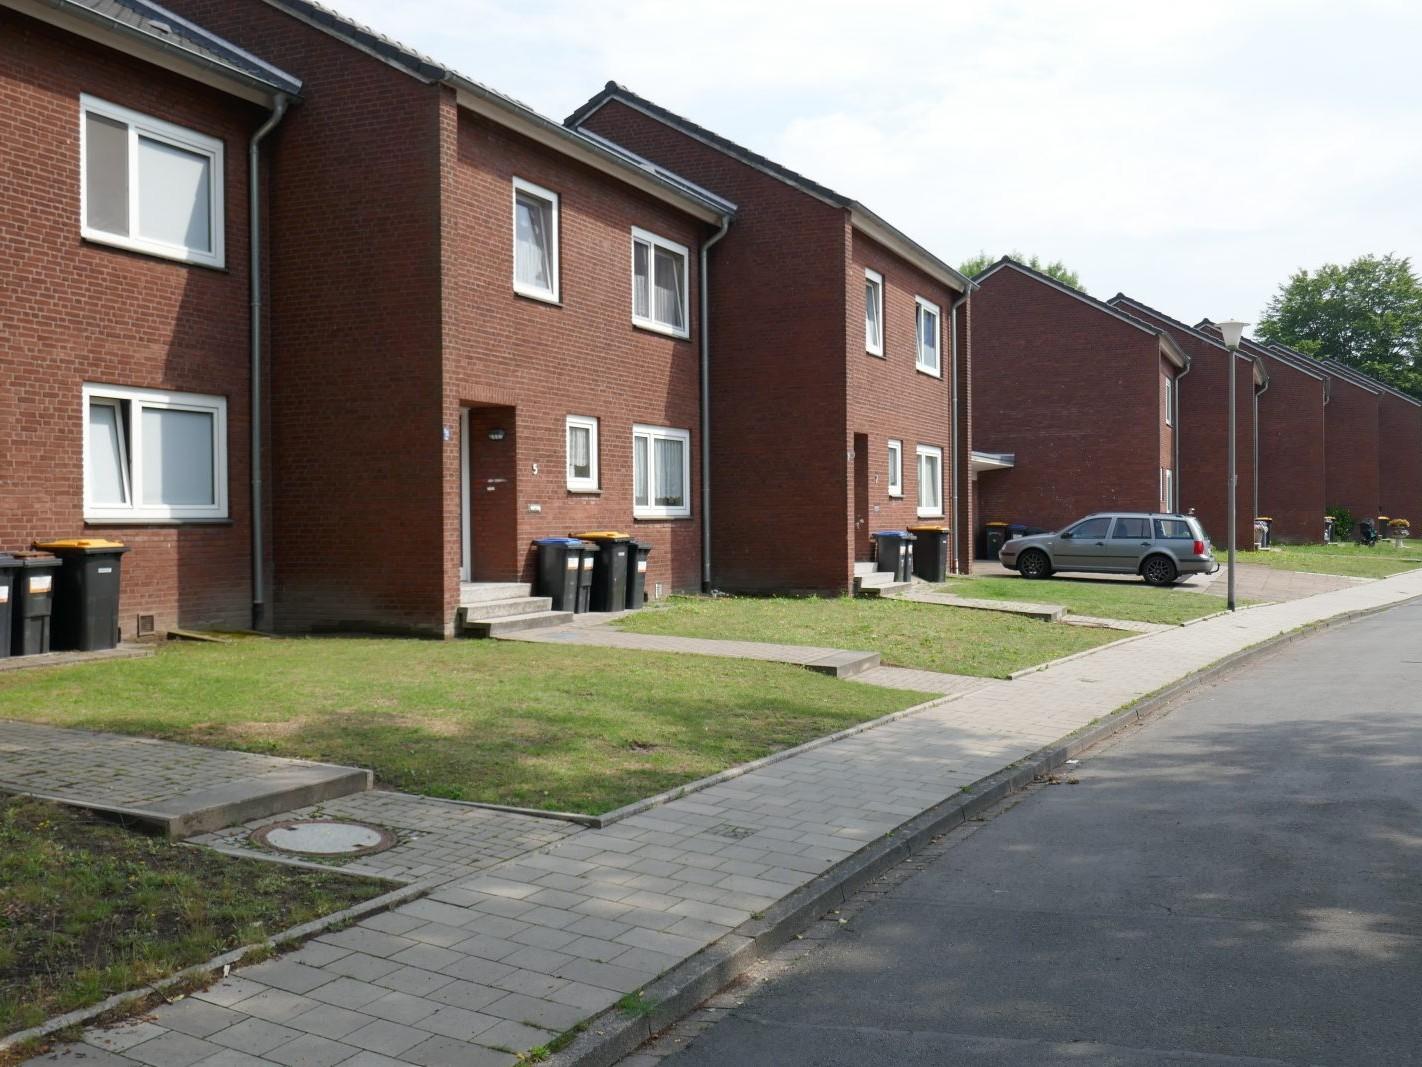 Münster vor Ort: Coerde - Nato-Siedlung - Foto: Stefan Rethfeld